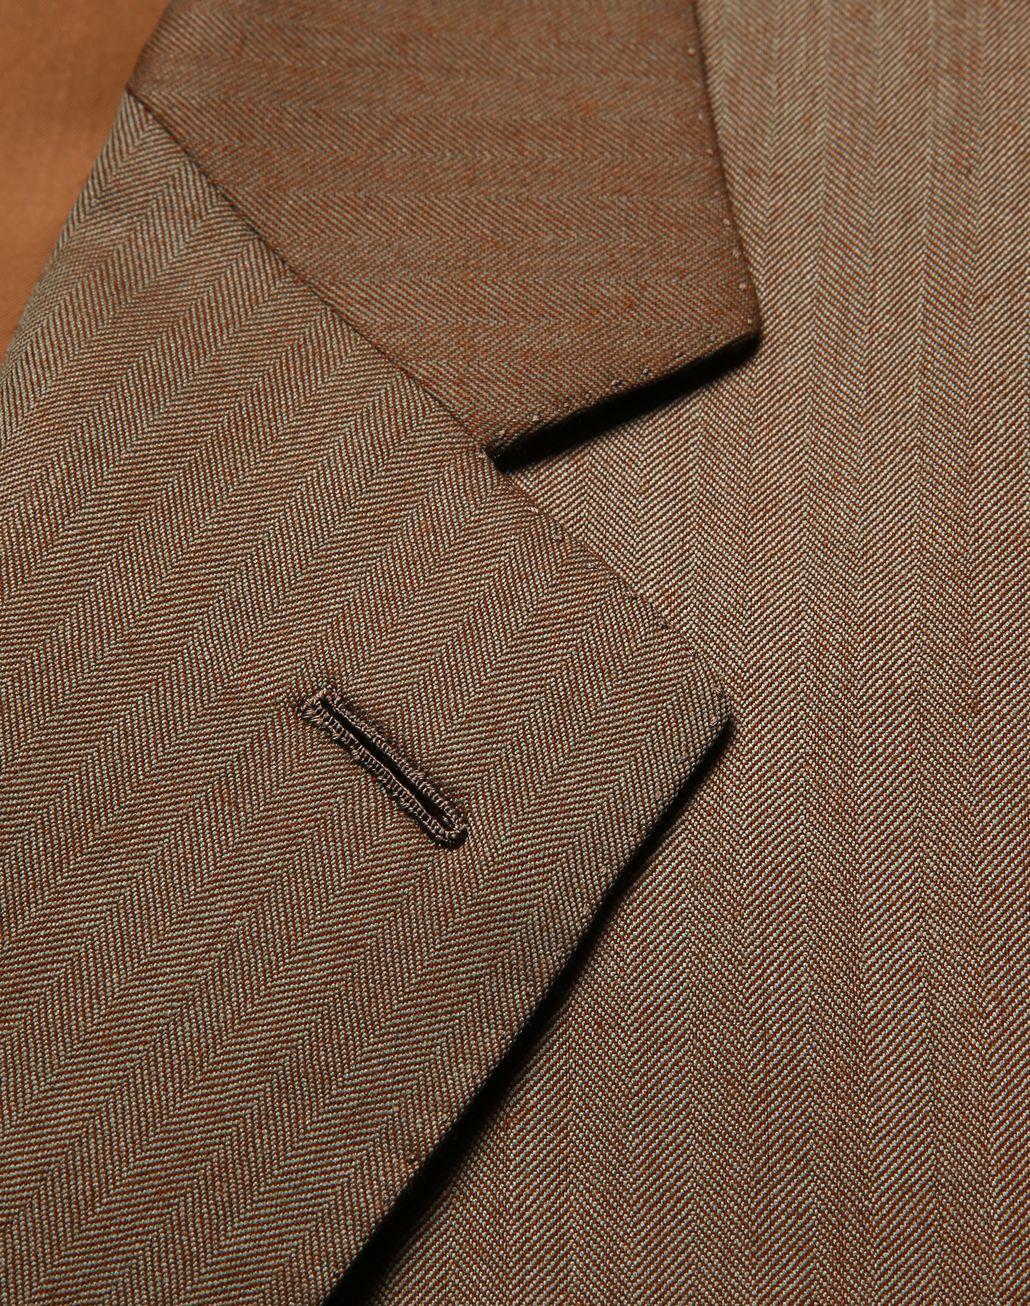 BRIONI Camel Herringbone Parioli Suit Suits & Jackets [*** pickupInStoreShippingNotGuaranteed_info ***] e